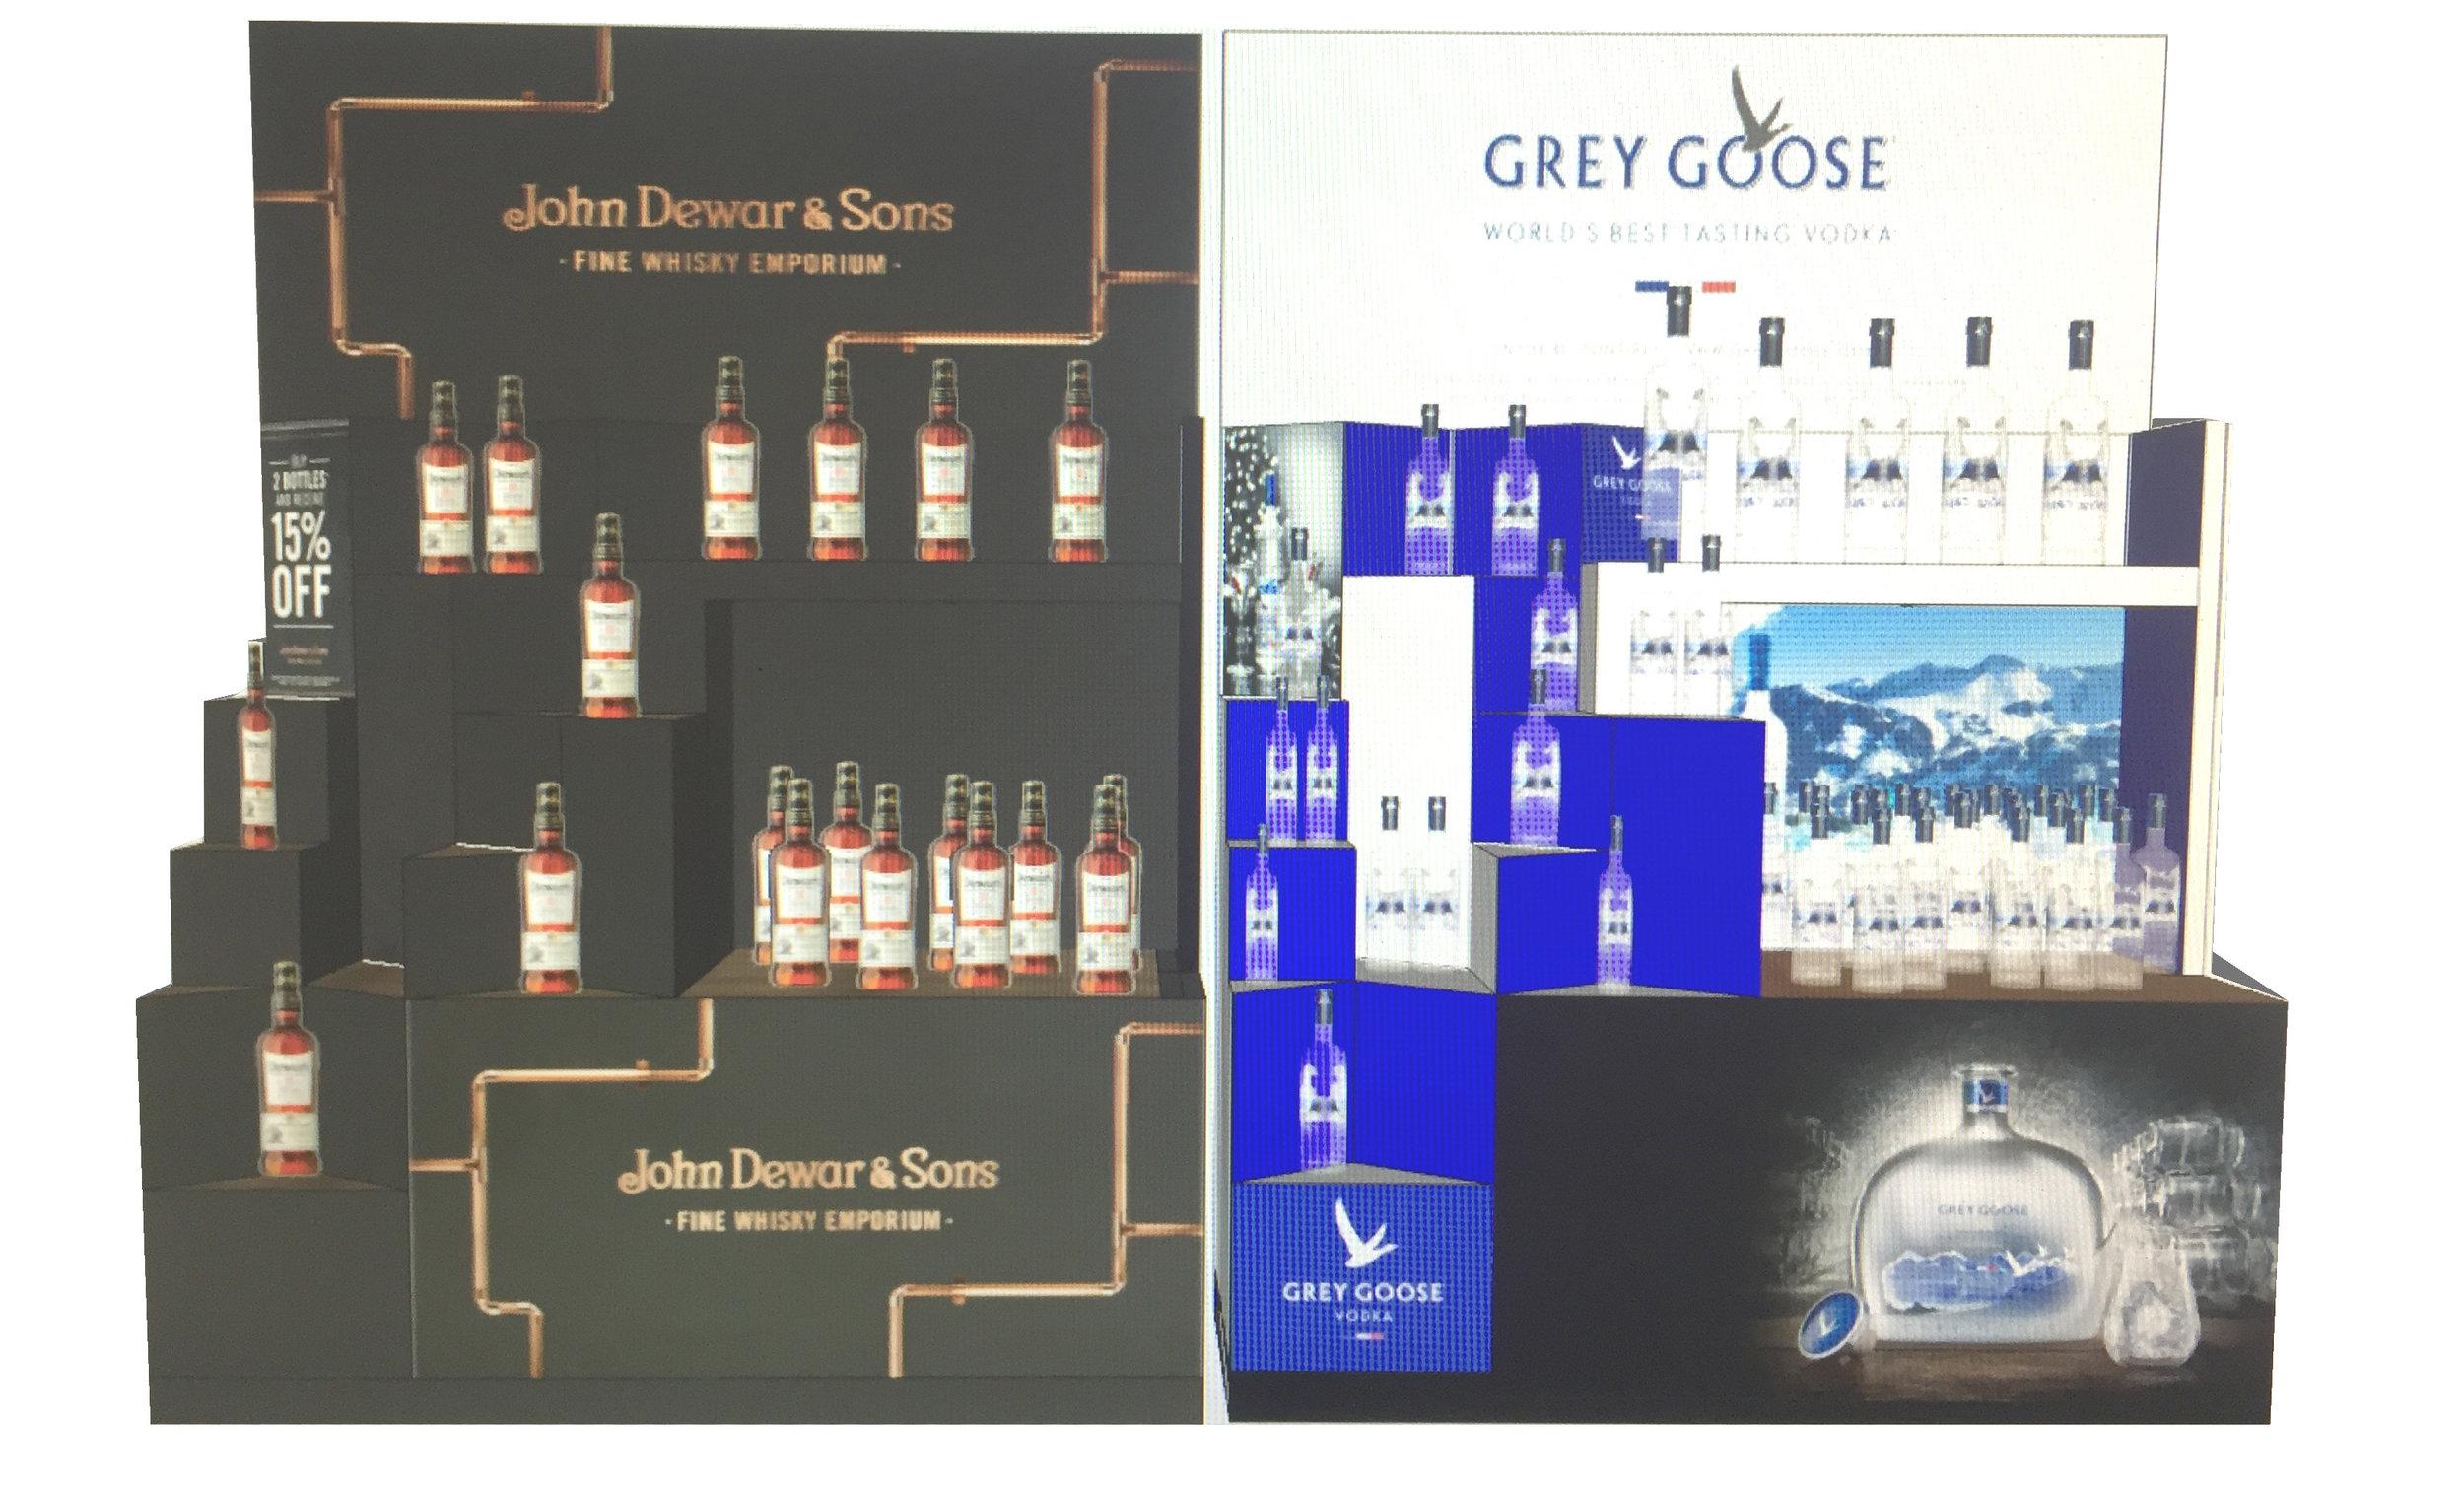 Grey Goose and John Dewars.jpg